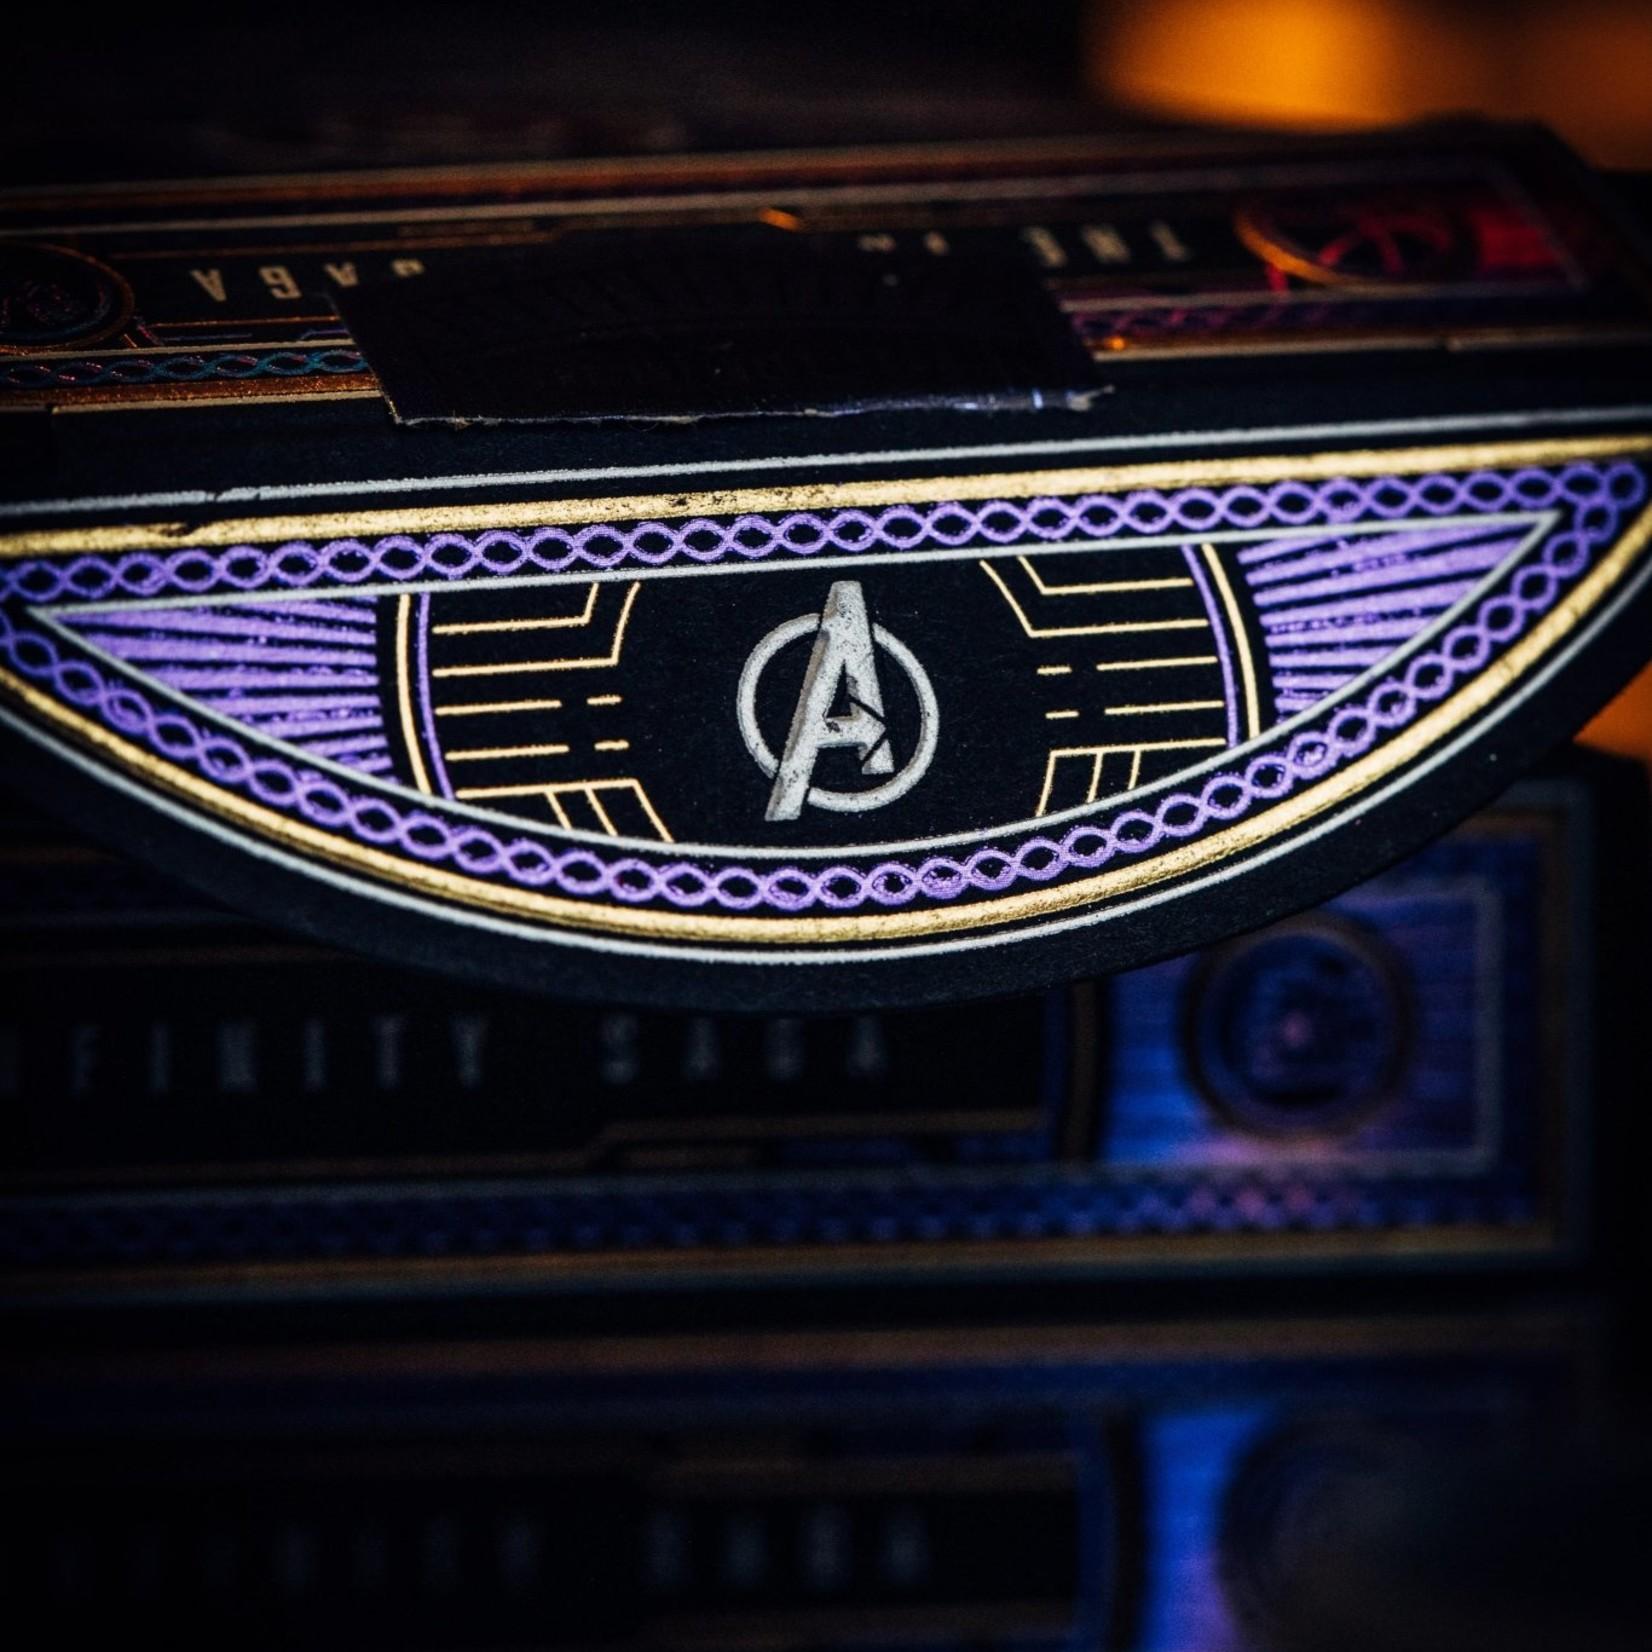 Theory 11 Theory 11 Avengers